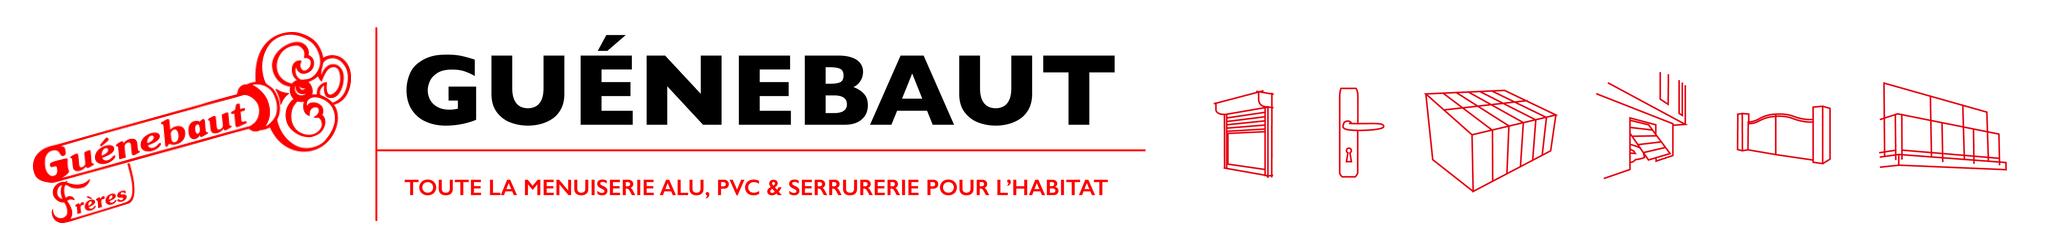 logo-guenebaut-big-new